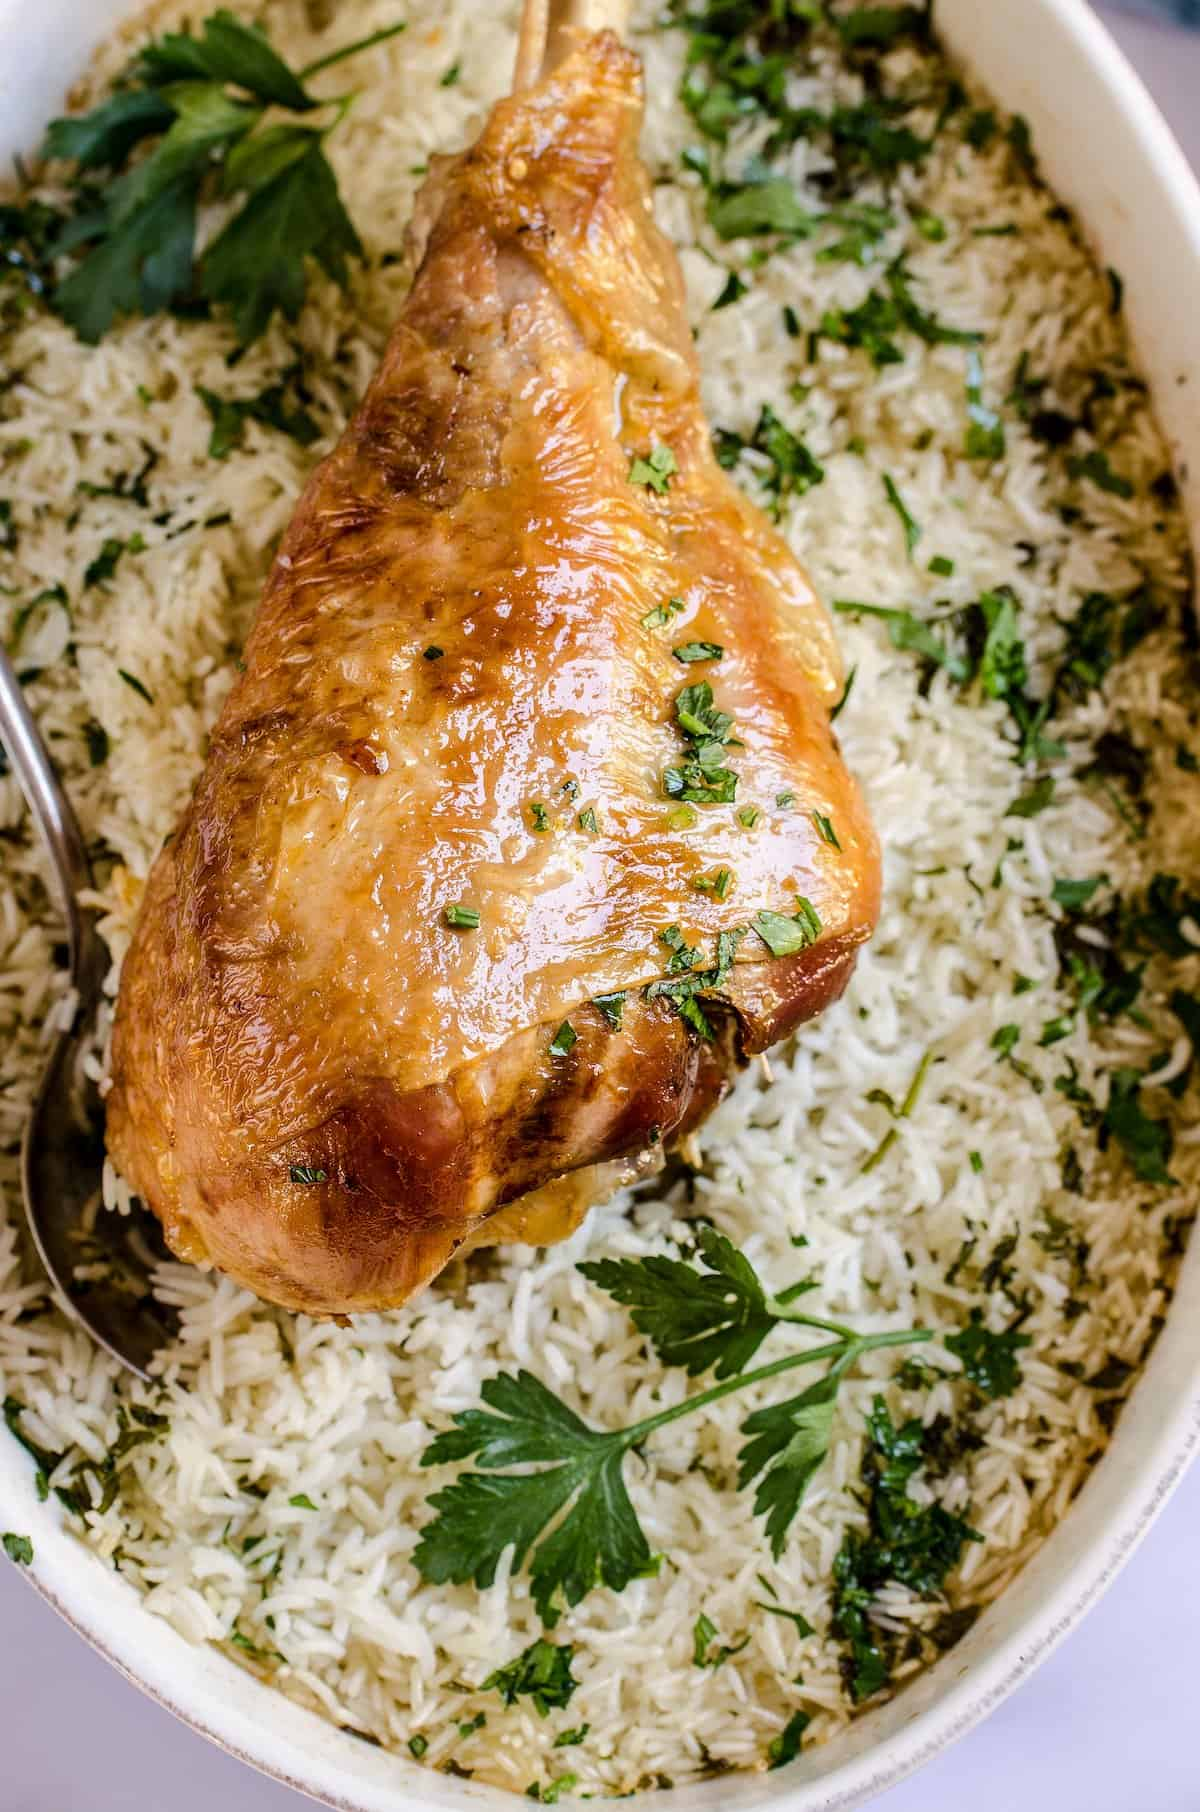 Turkey and long grain rice in a baking dish.